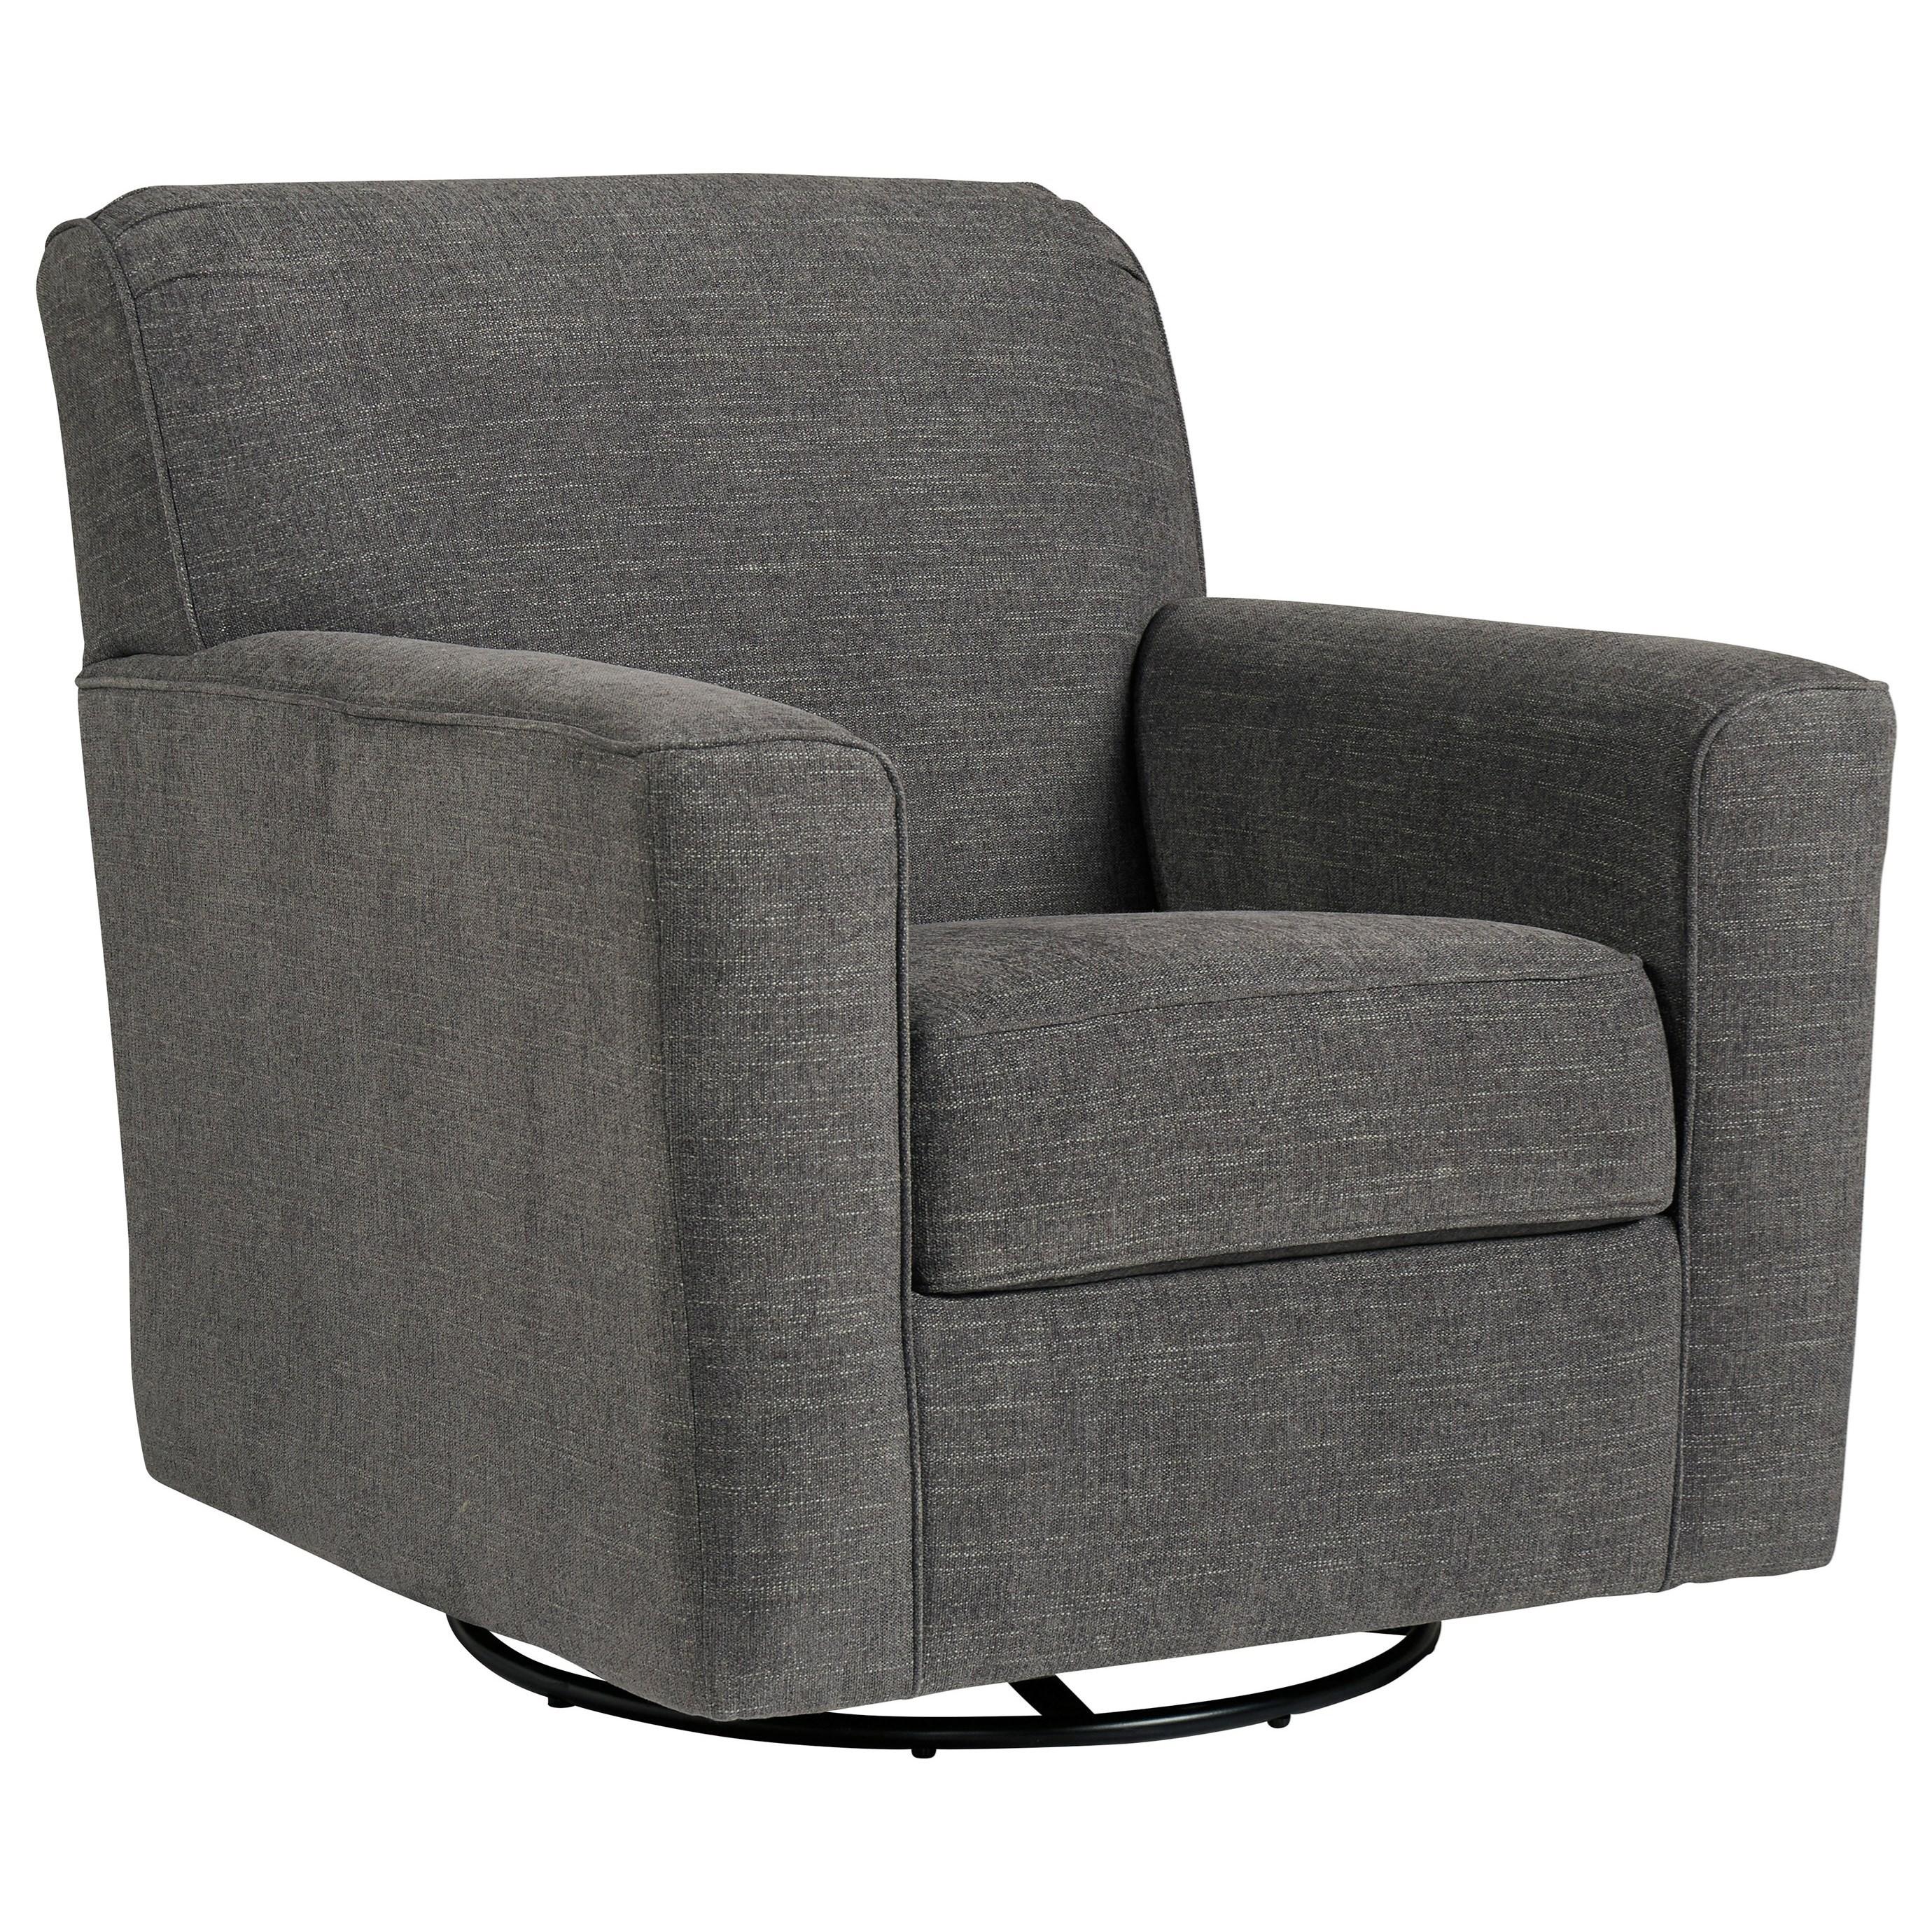 Ashley Furniture Superstore: Ashley Furniture Alcona Swivel Glider Accent Chair In Gray